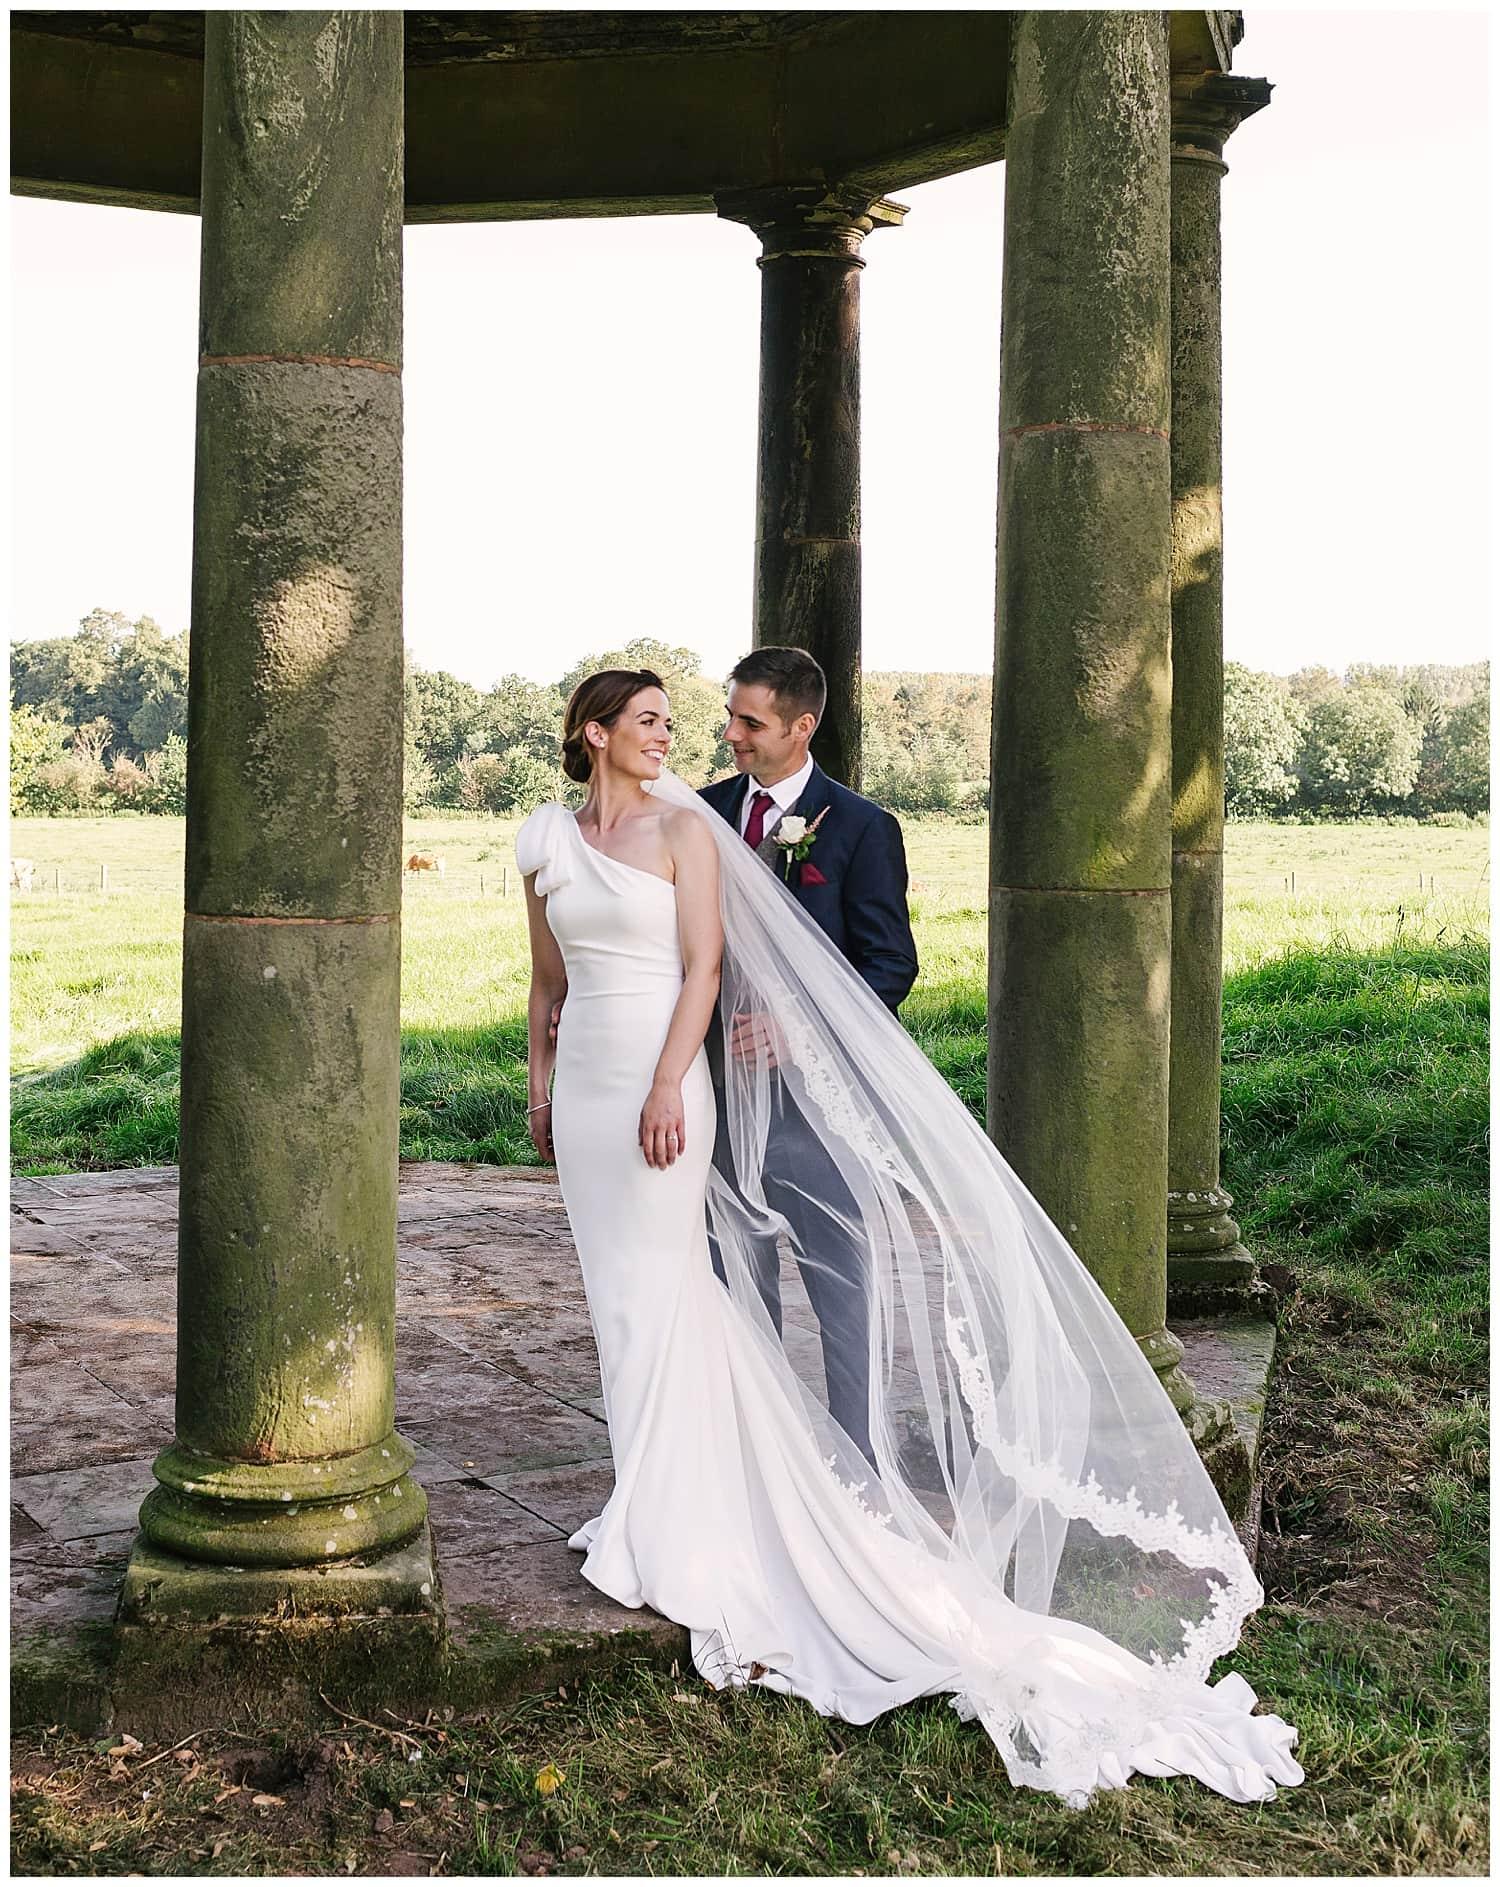 portrait of a modern farming couple on their wedding day